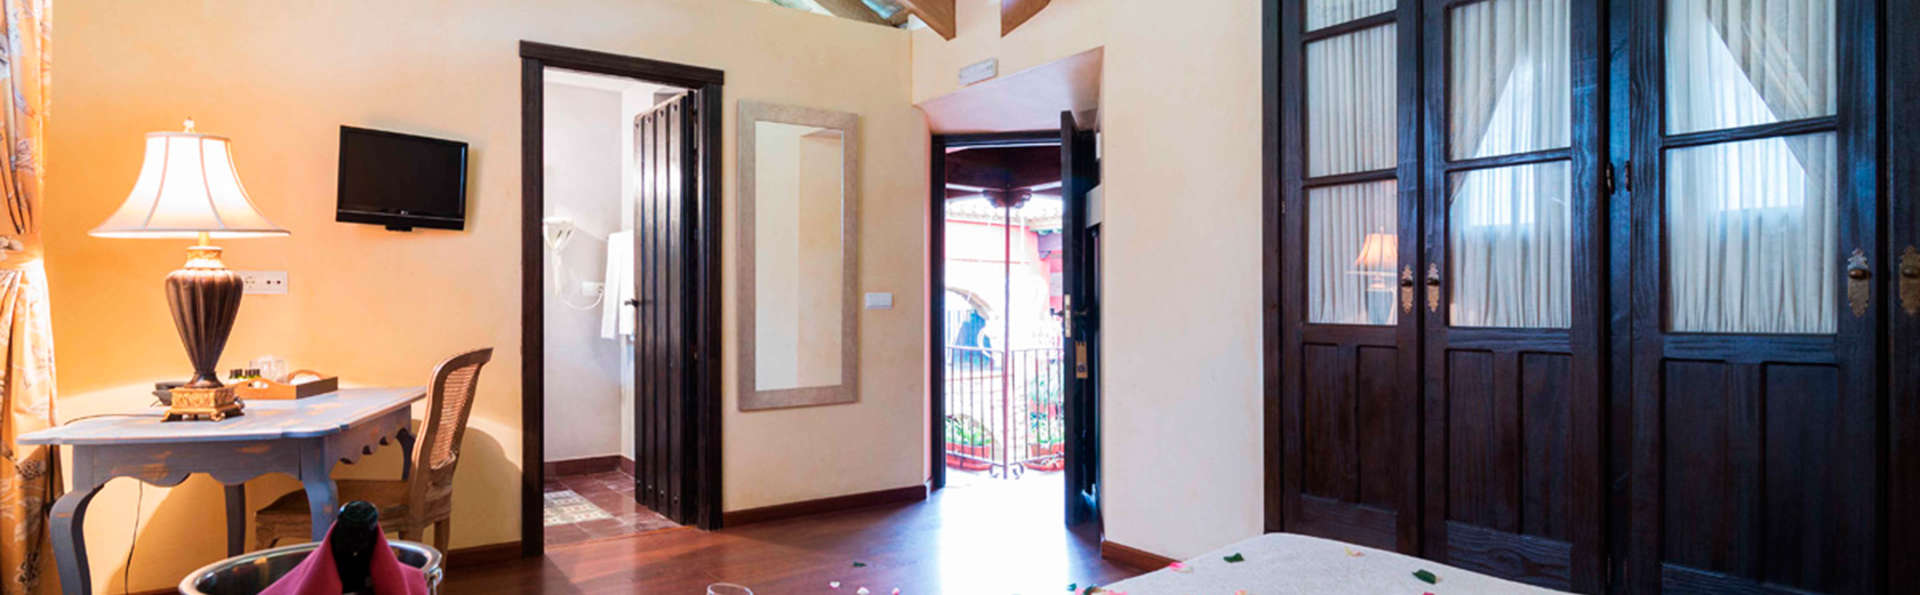 Escapada Romántica en el centro histórico de Osuna